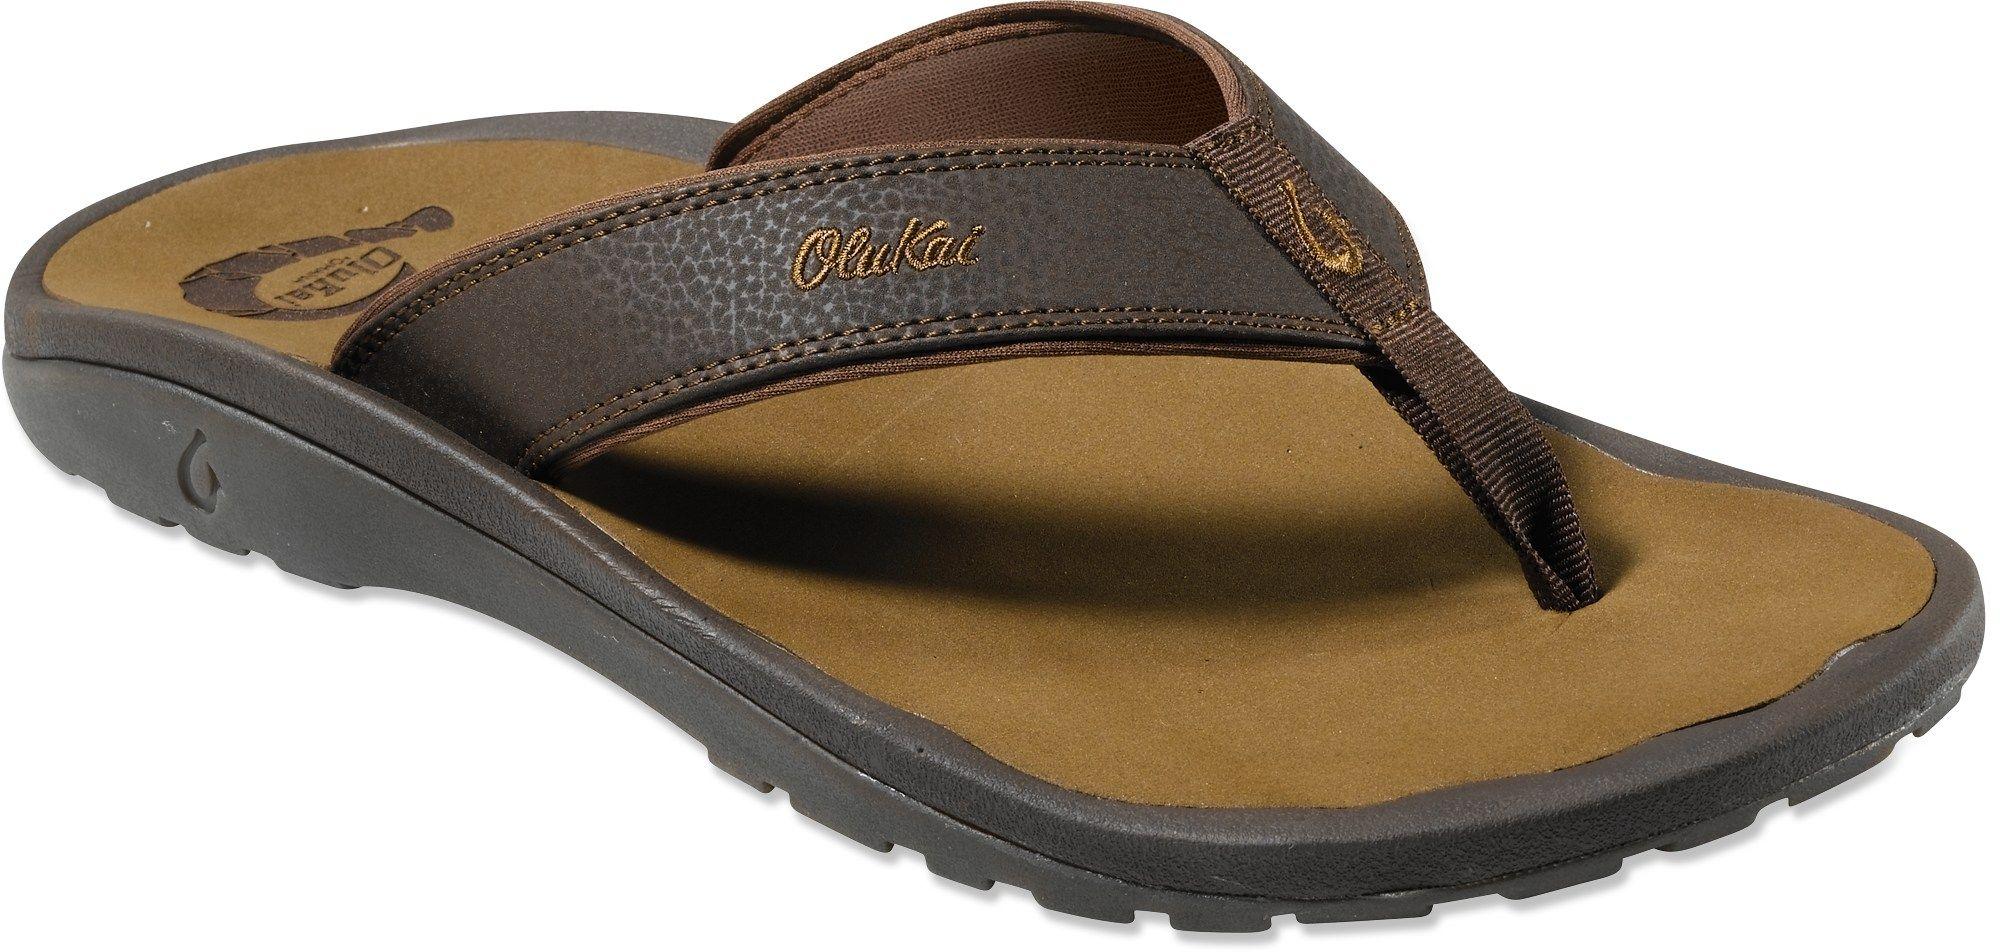 up flops sandals comforter sandal benassi most nike shirts to for men save flip jdi shoes comfortable women t authentic soccer swoosh puma c